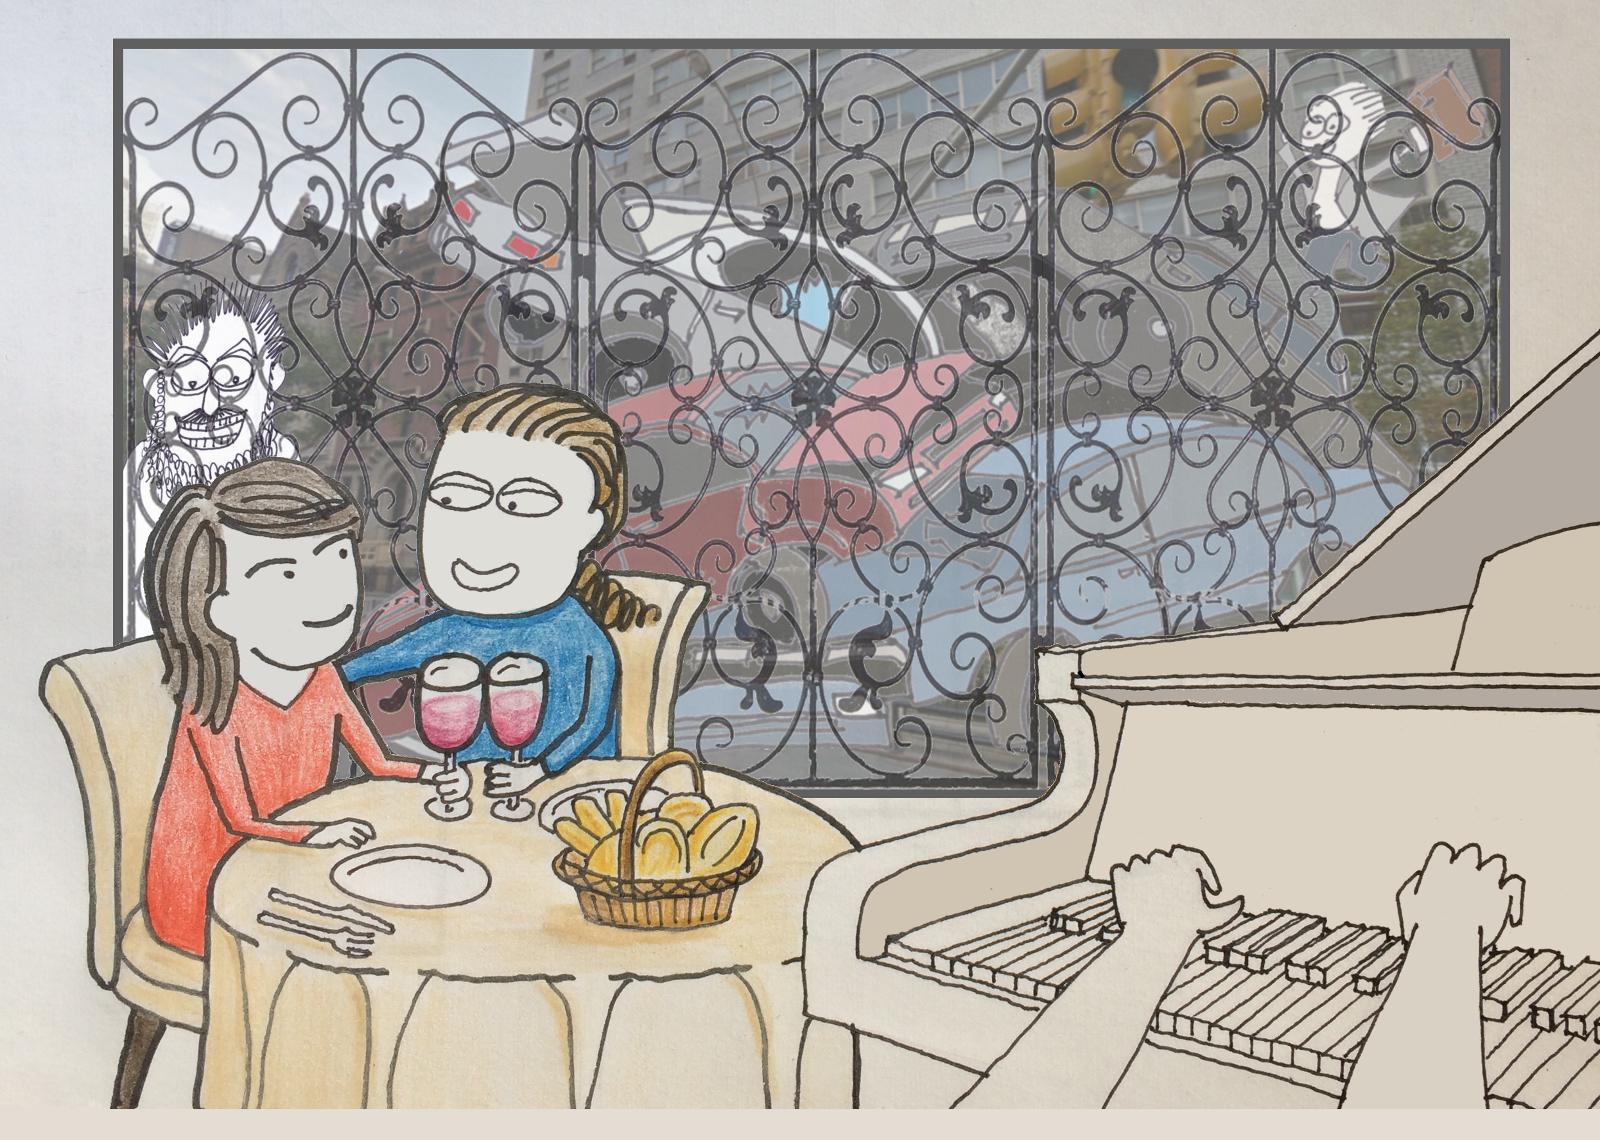 Illustration by Peipei